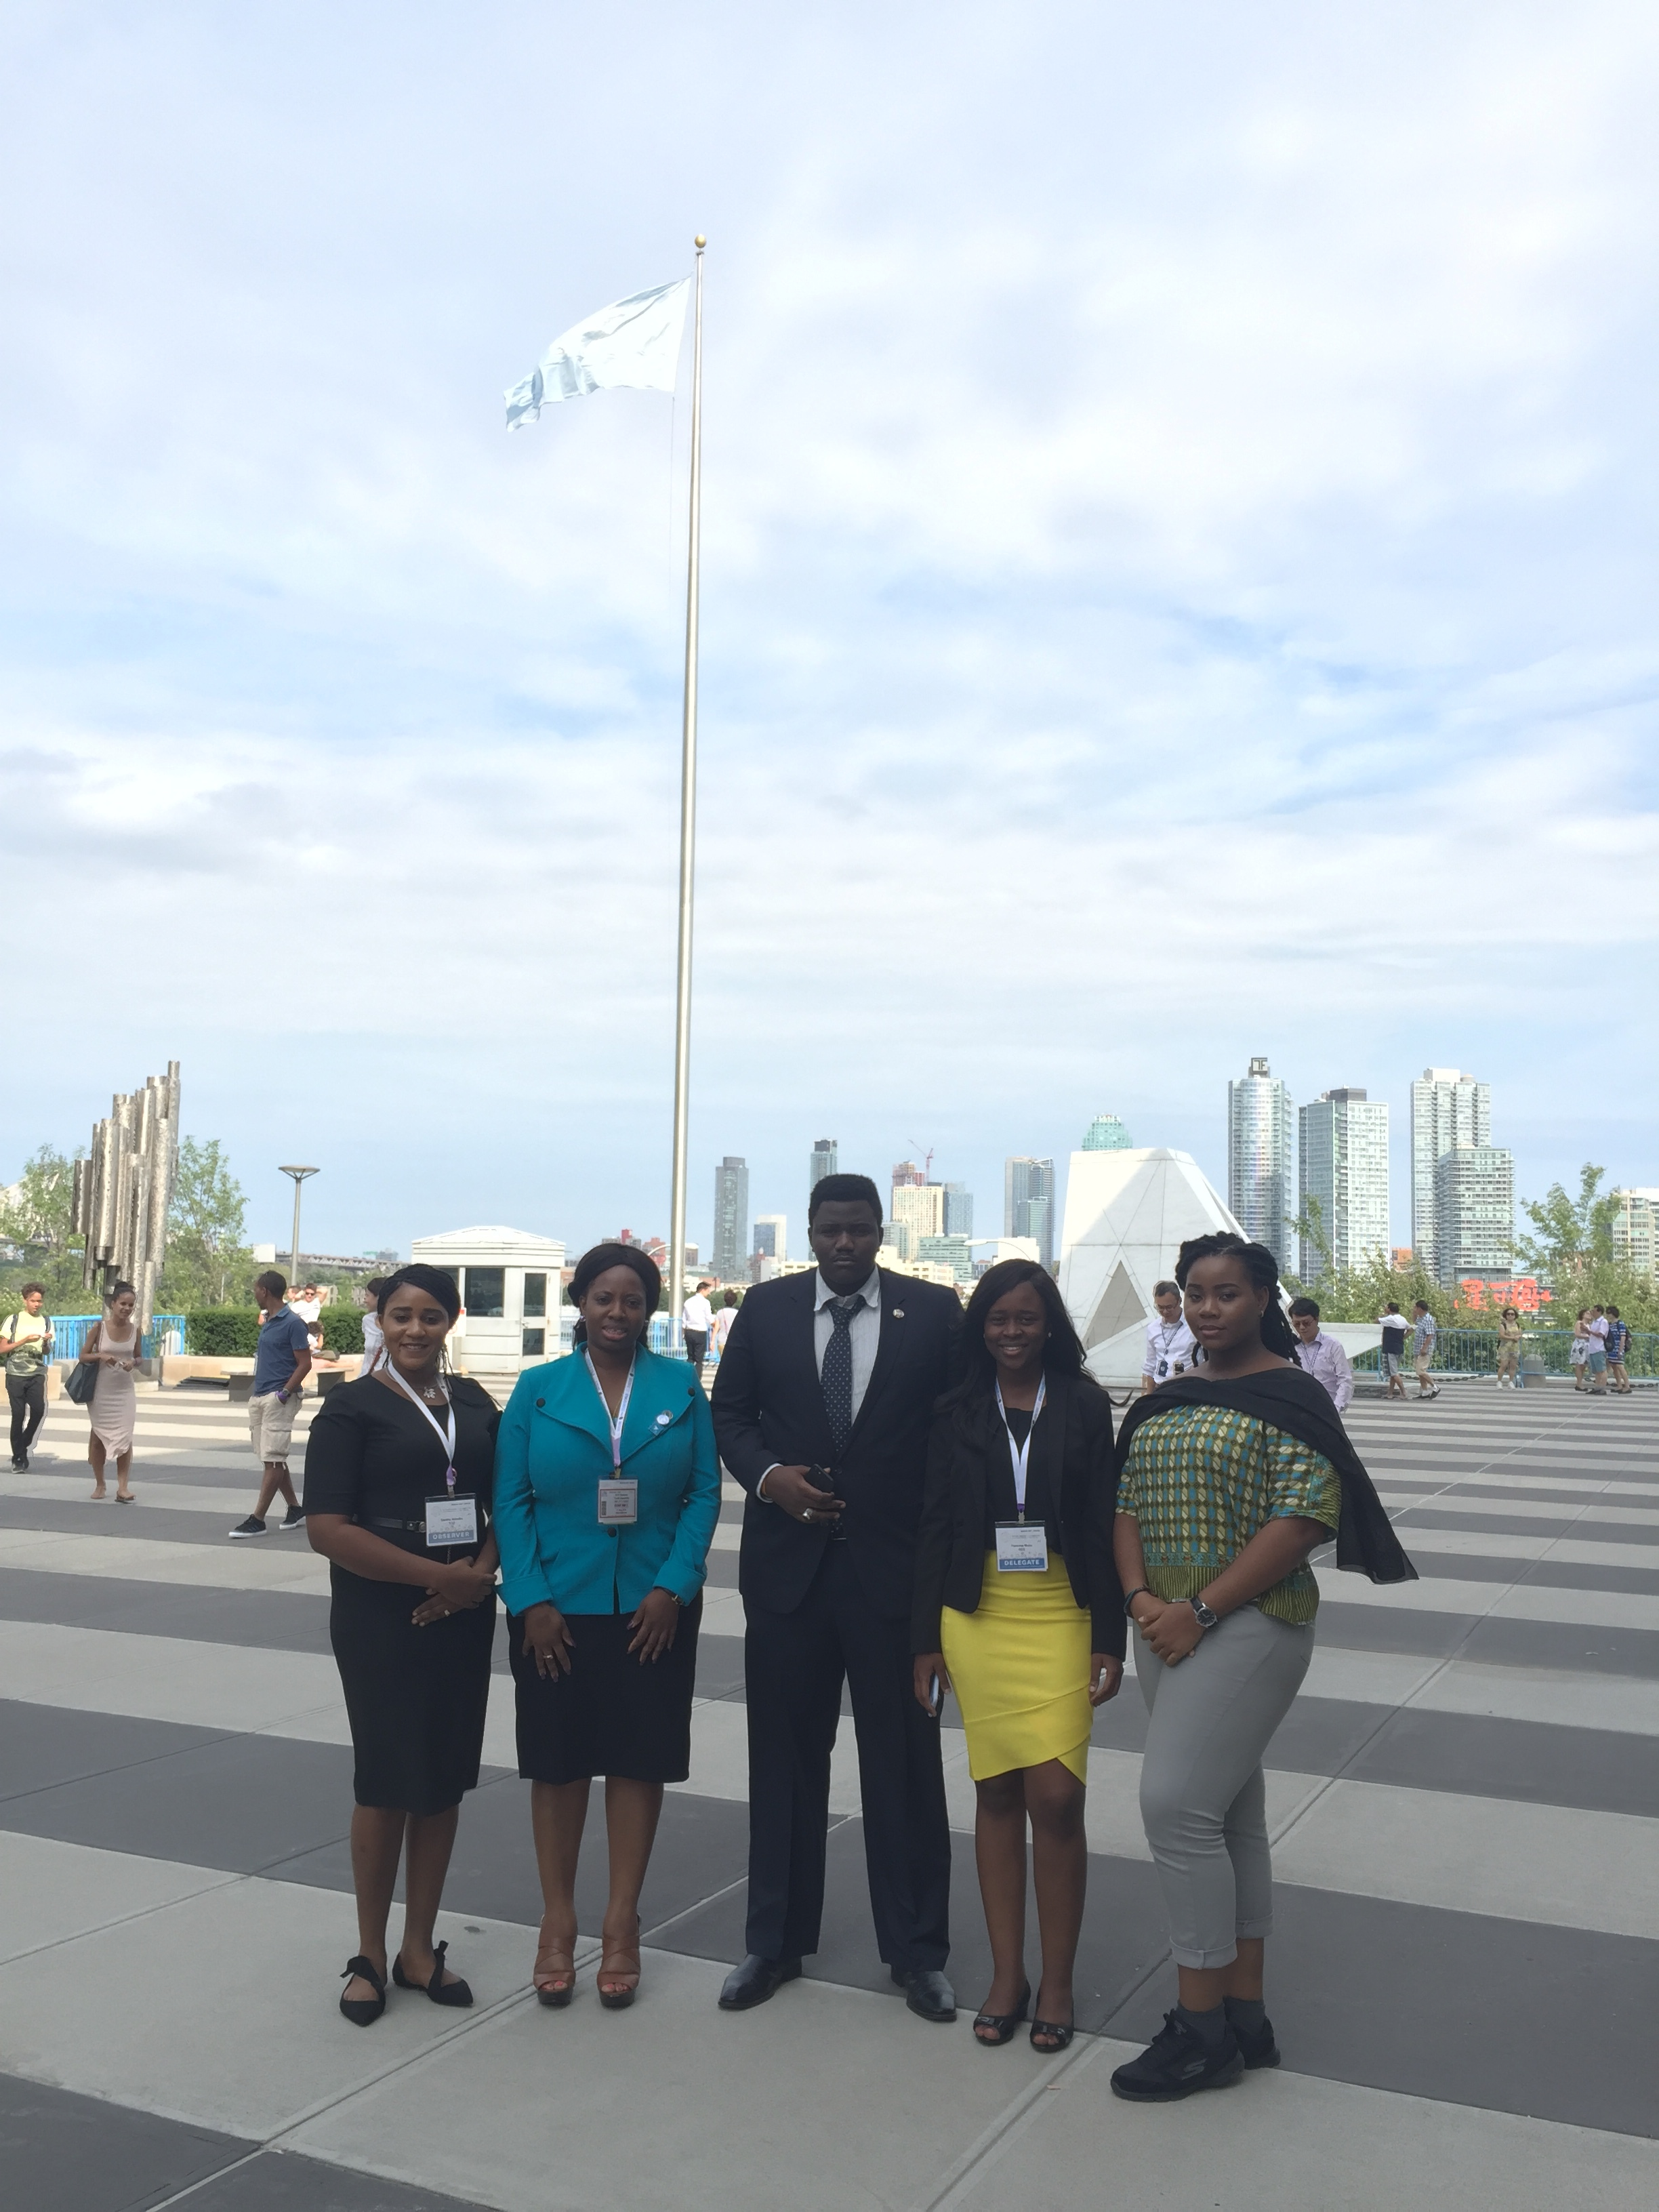 Names of group members: Vida Ofei-Addo (Ghana),Francess Munu (Sierra Leone),Tabitha Abimiku (Nigeria), Enoabasi Nta (Nigeria) and Sekou Sangare (Mali)